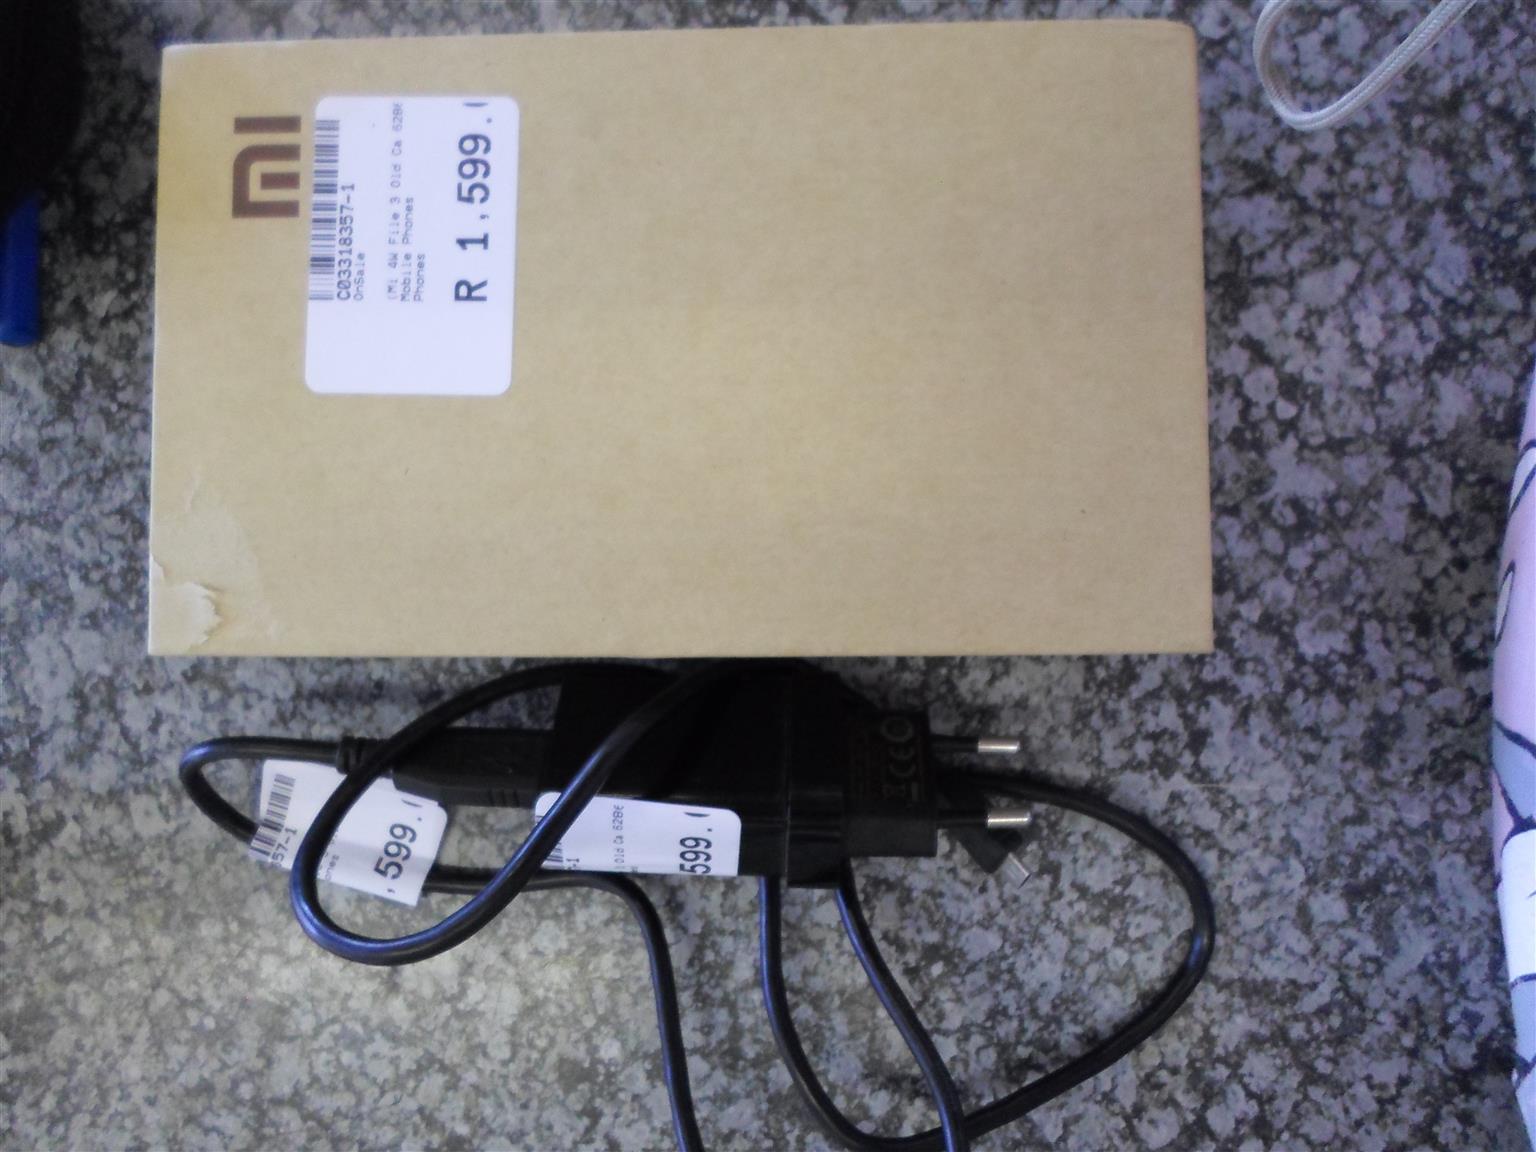 16GB MI 4 WCDMA Cellphone